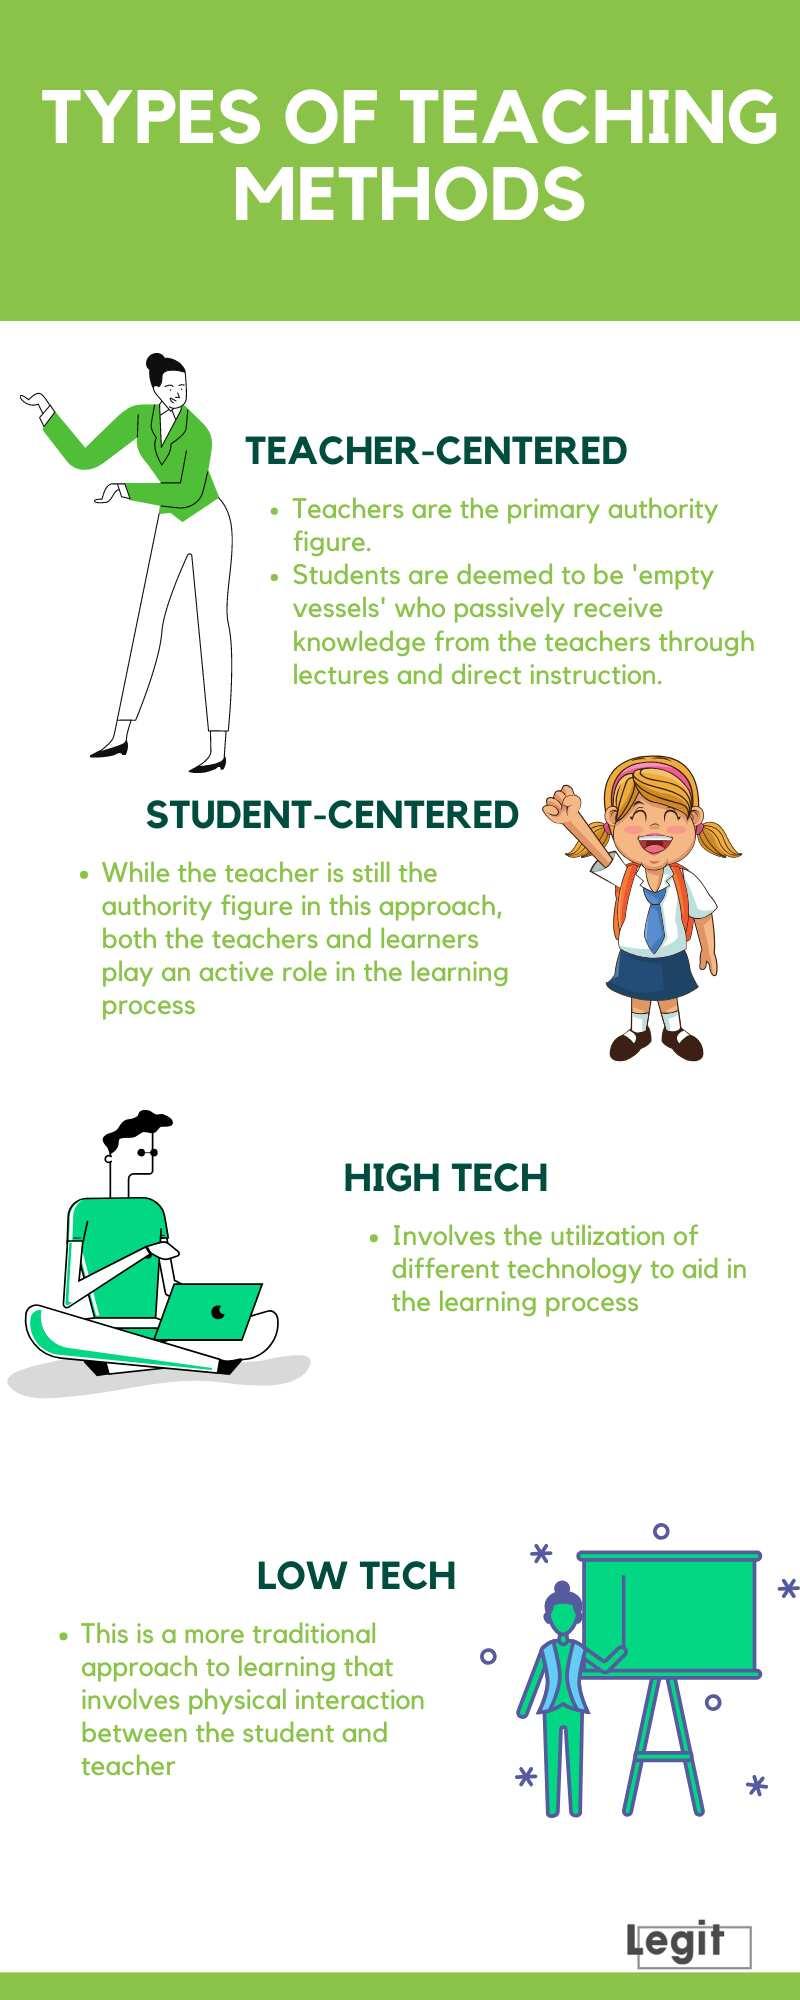 Types of teaching methods